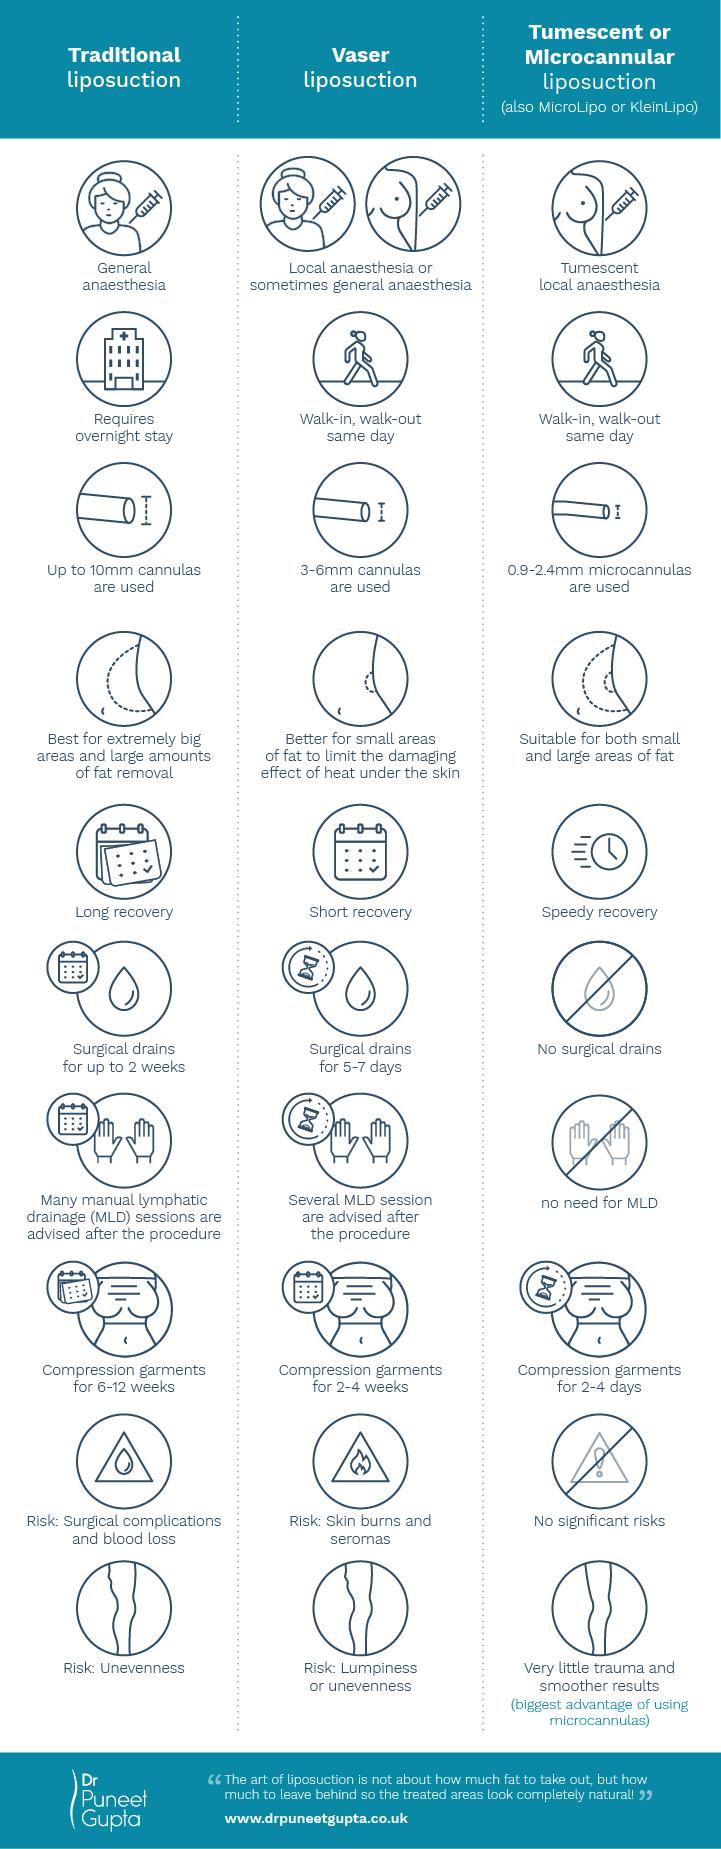 liposuction infographic